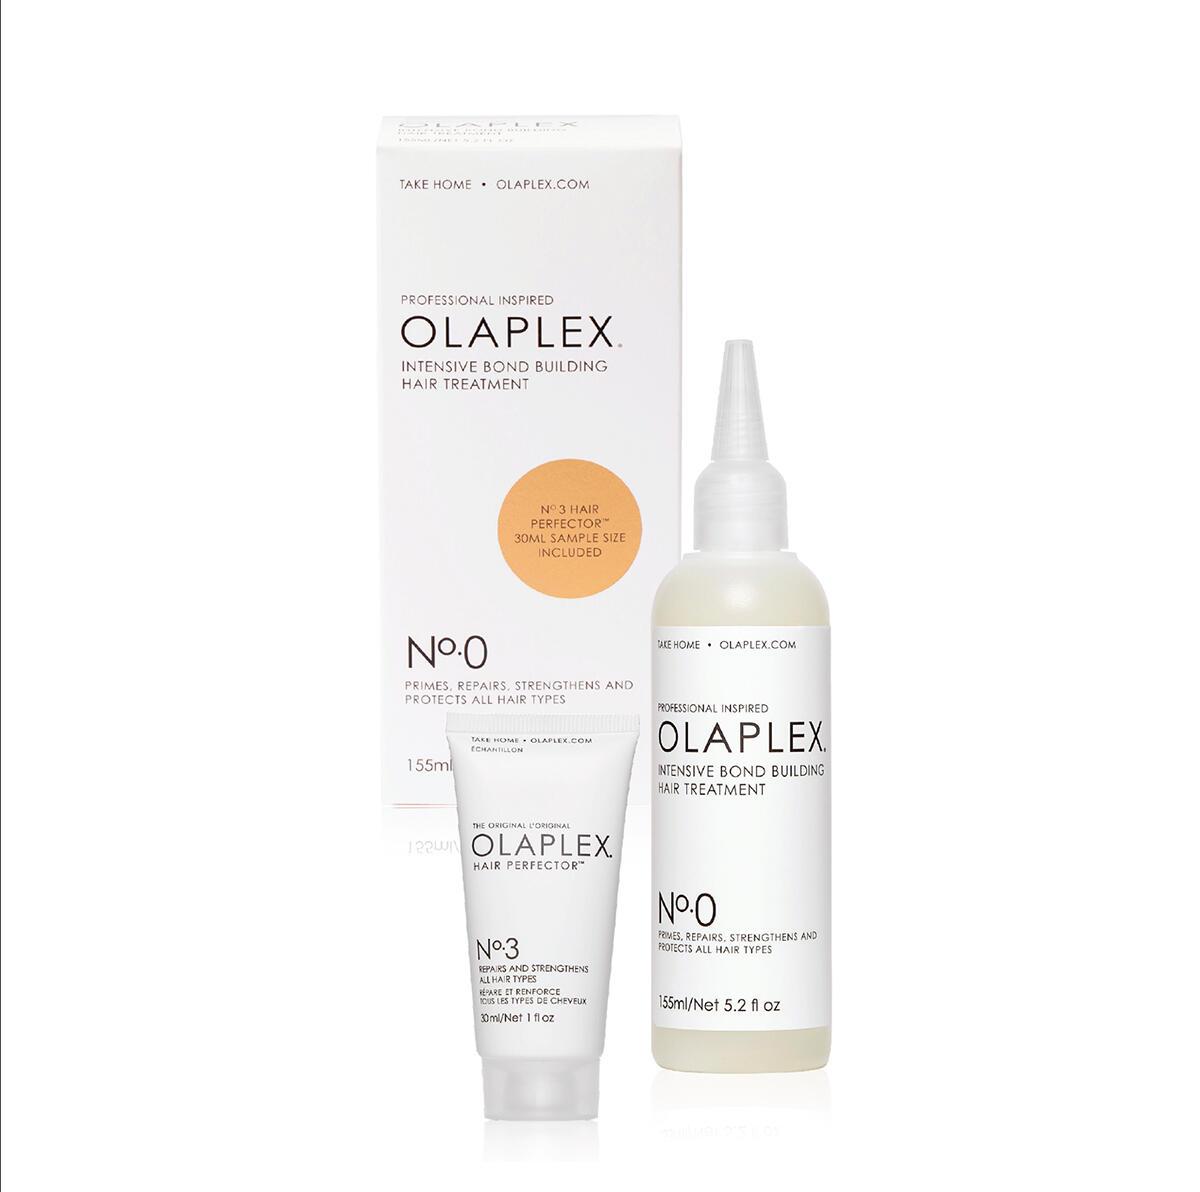 Olaplex No.0 Intensive Bond Building Treatment